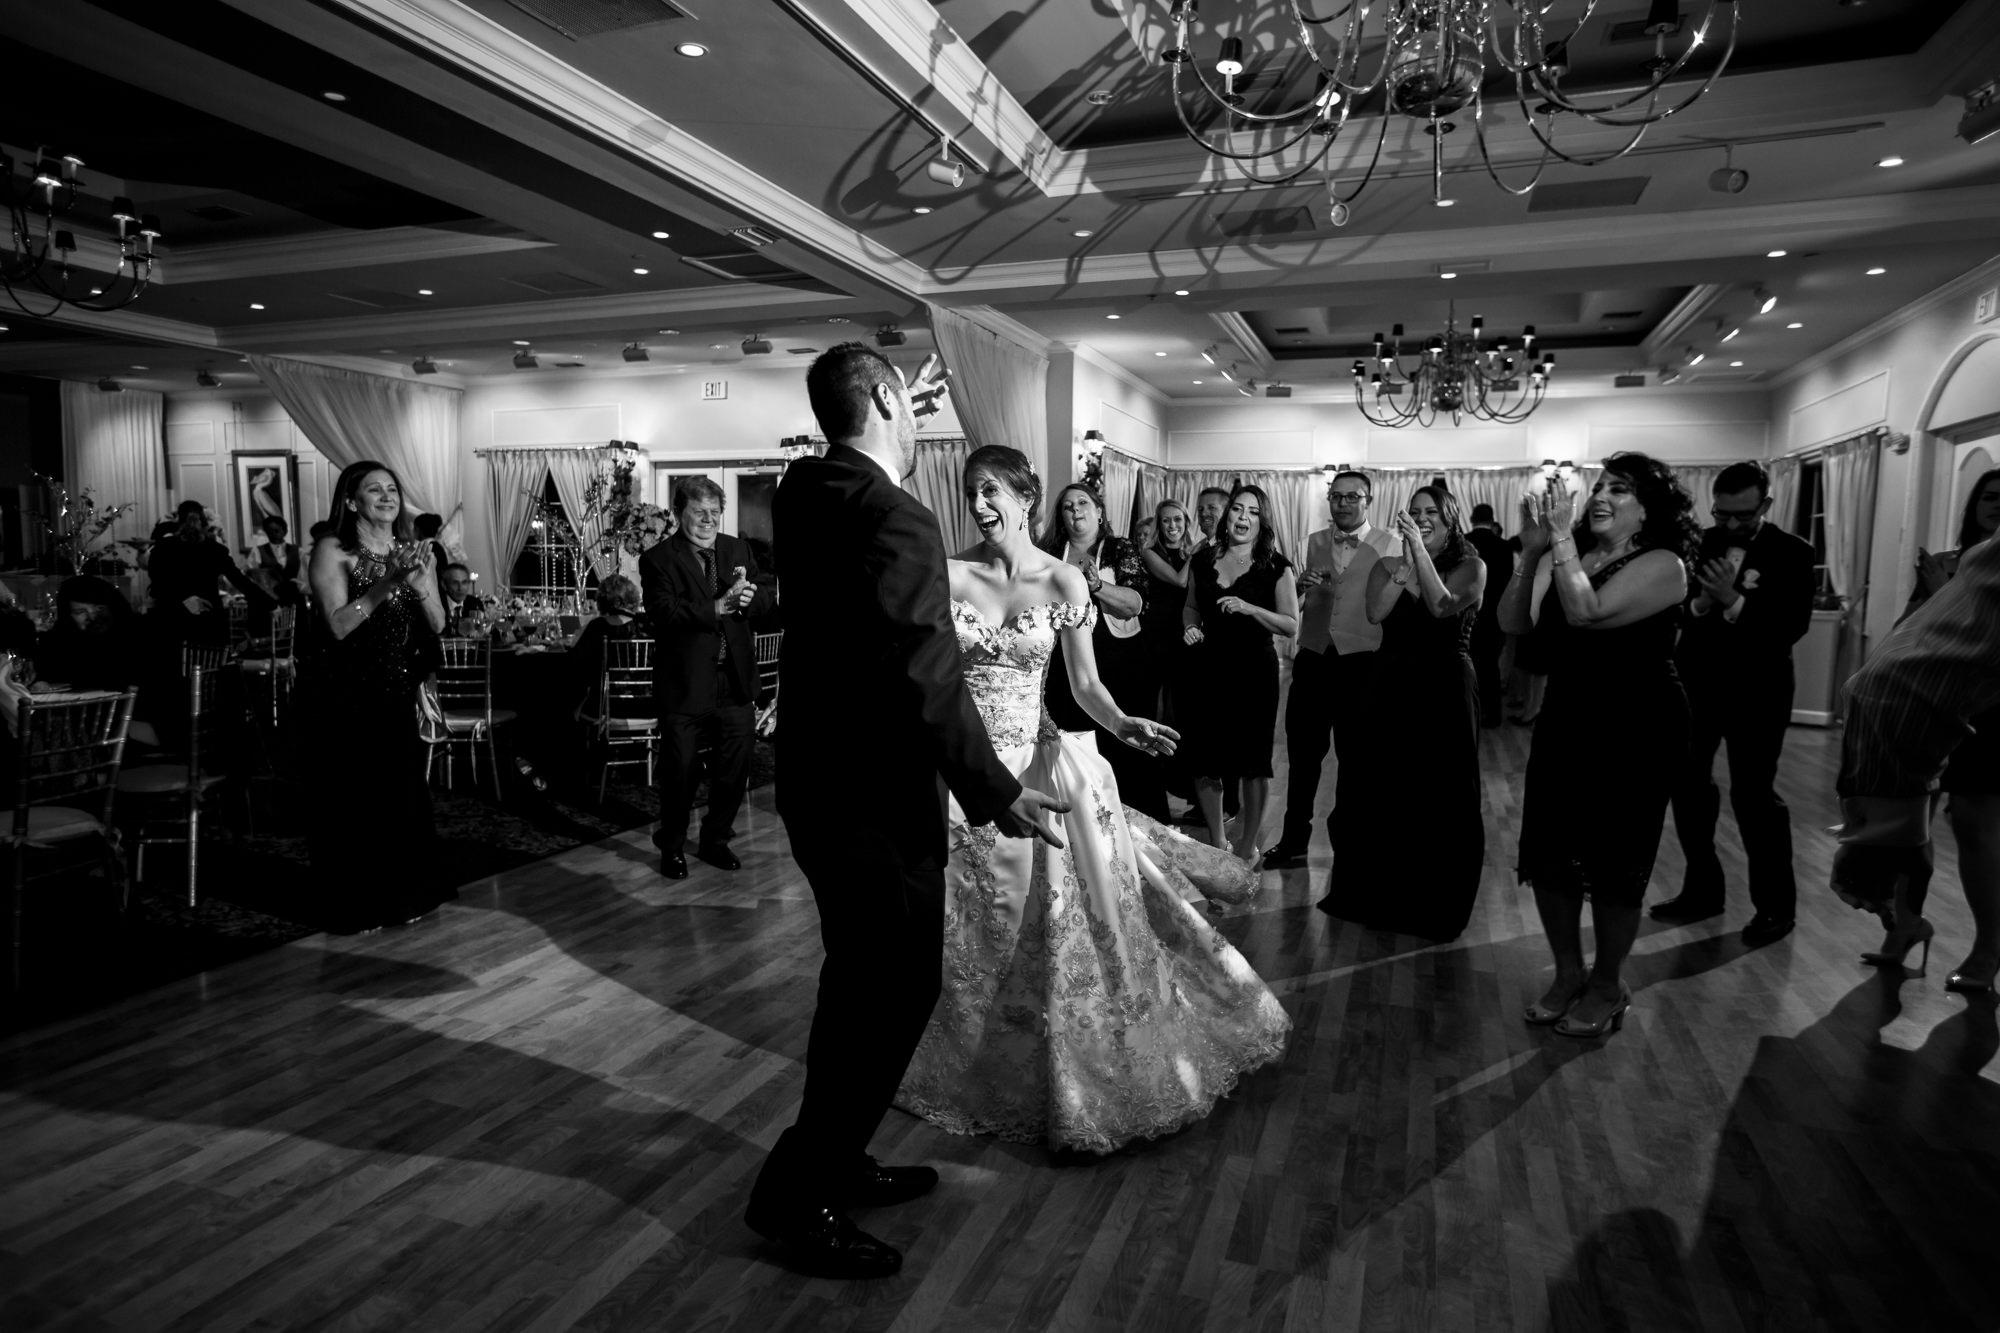 Benvenuto_Wedding_catholic_Florida_Bride-Groom-129.jpg